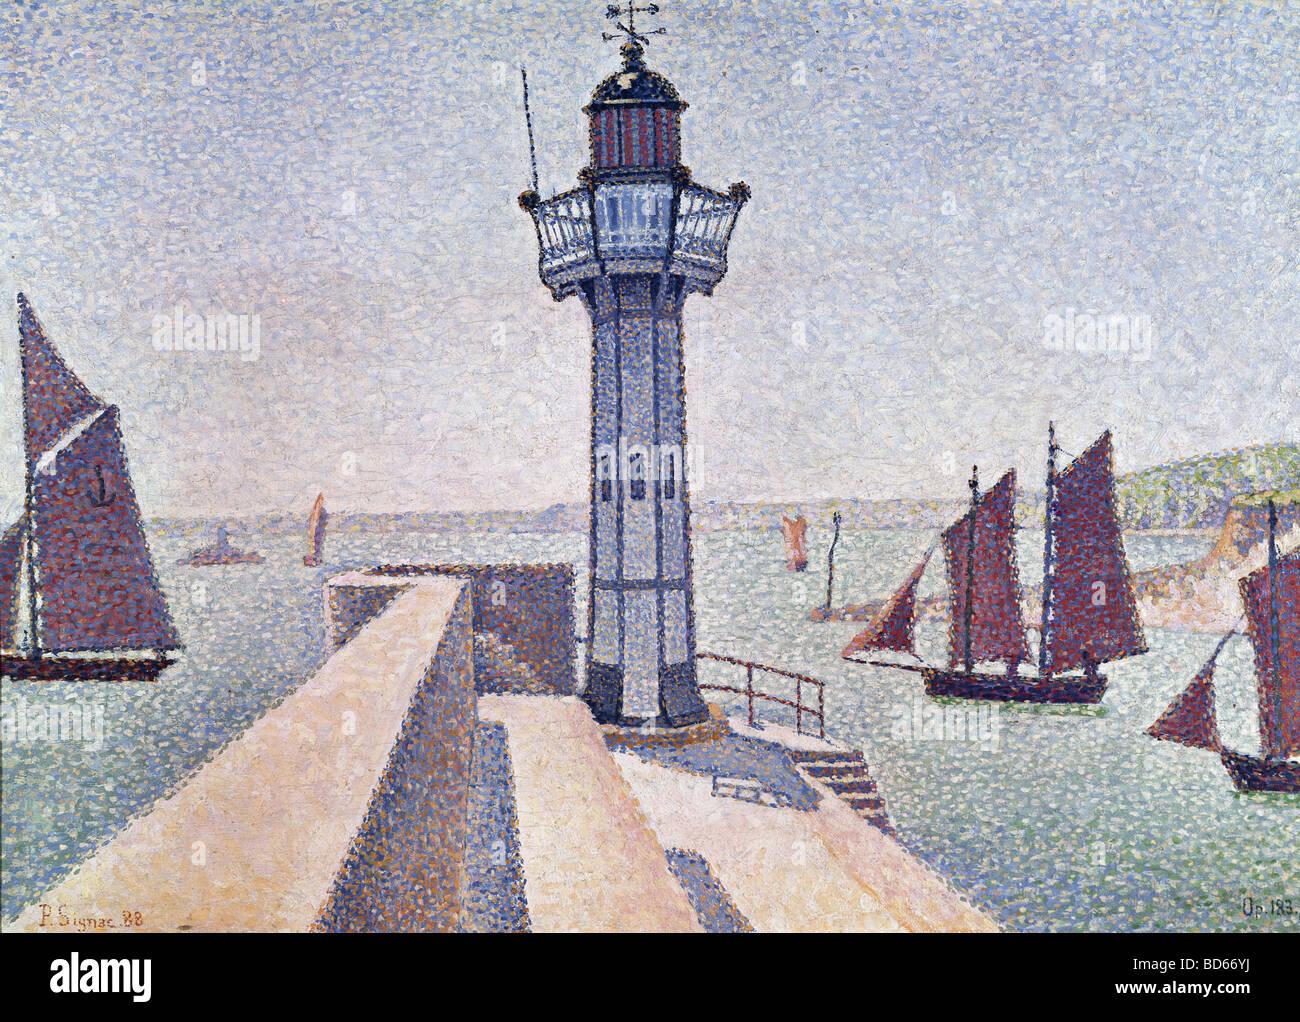 "Belle arti, Signac Paul, (1863 - 1935), pittura, 'Portrieux, Le Phare"", 1888, Rijksmuseum Kröller Immagini Stock"